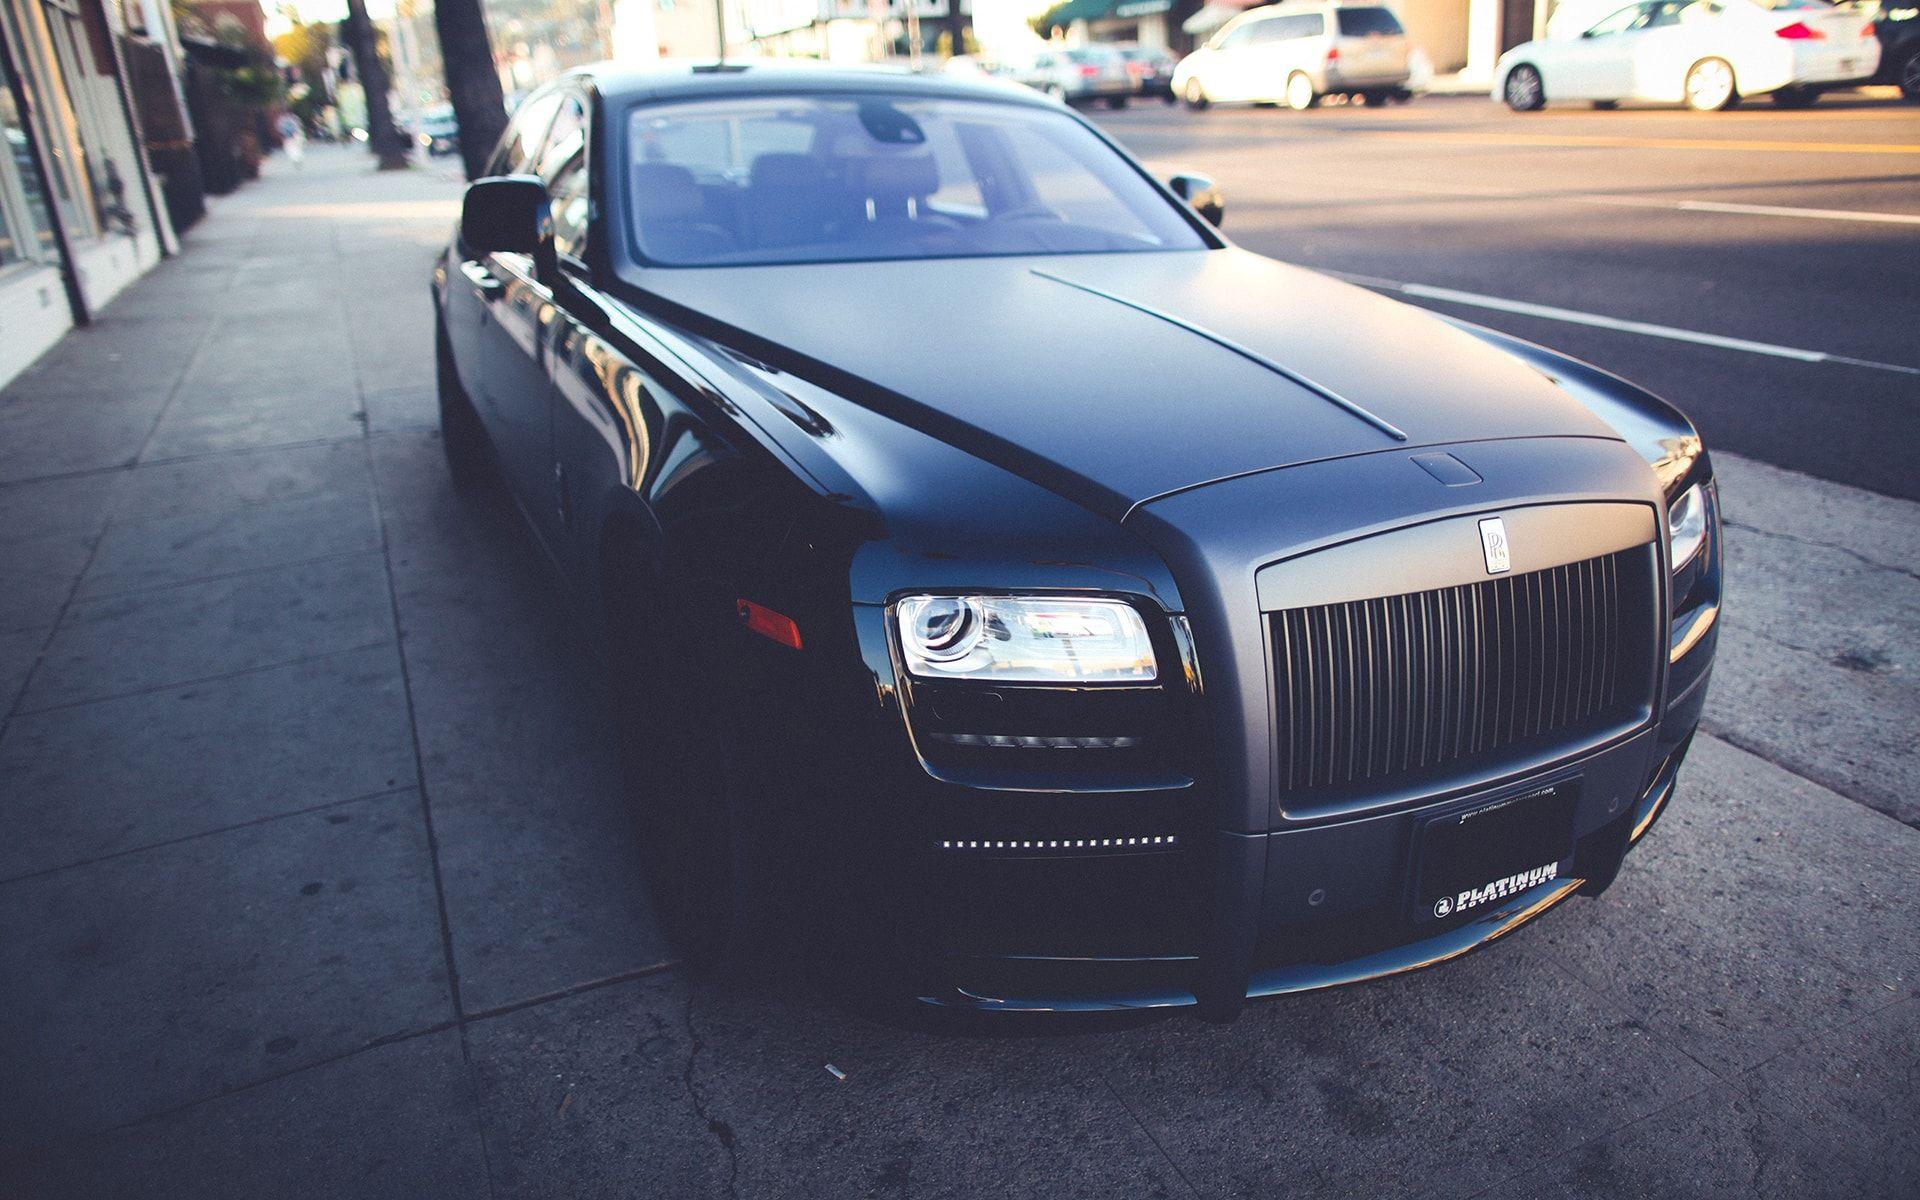 Rolls Royce Ghost Black The Best Wallpaper Backgrounds Pinterest